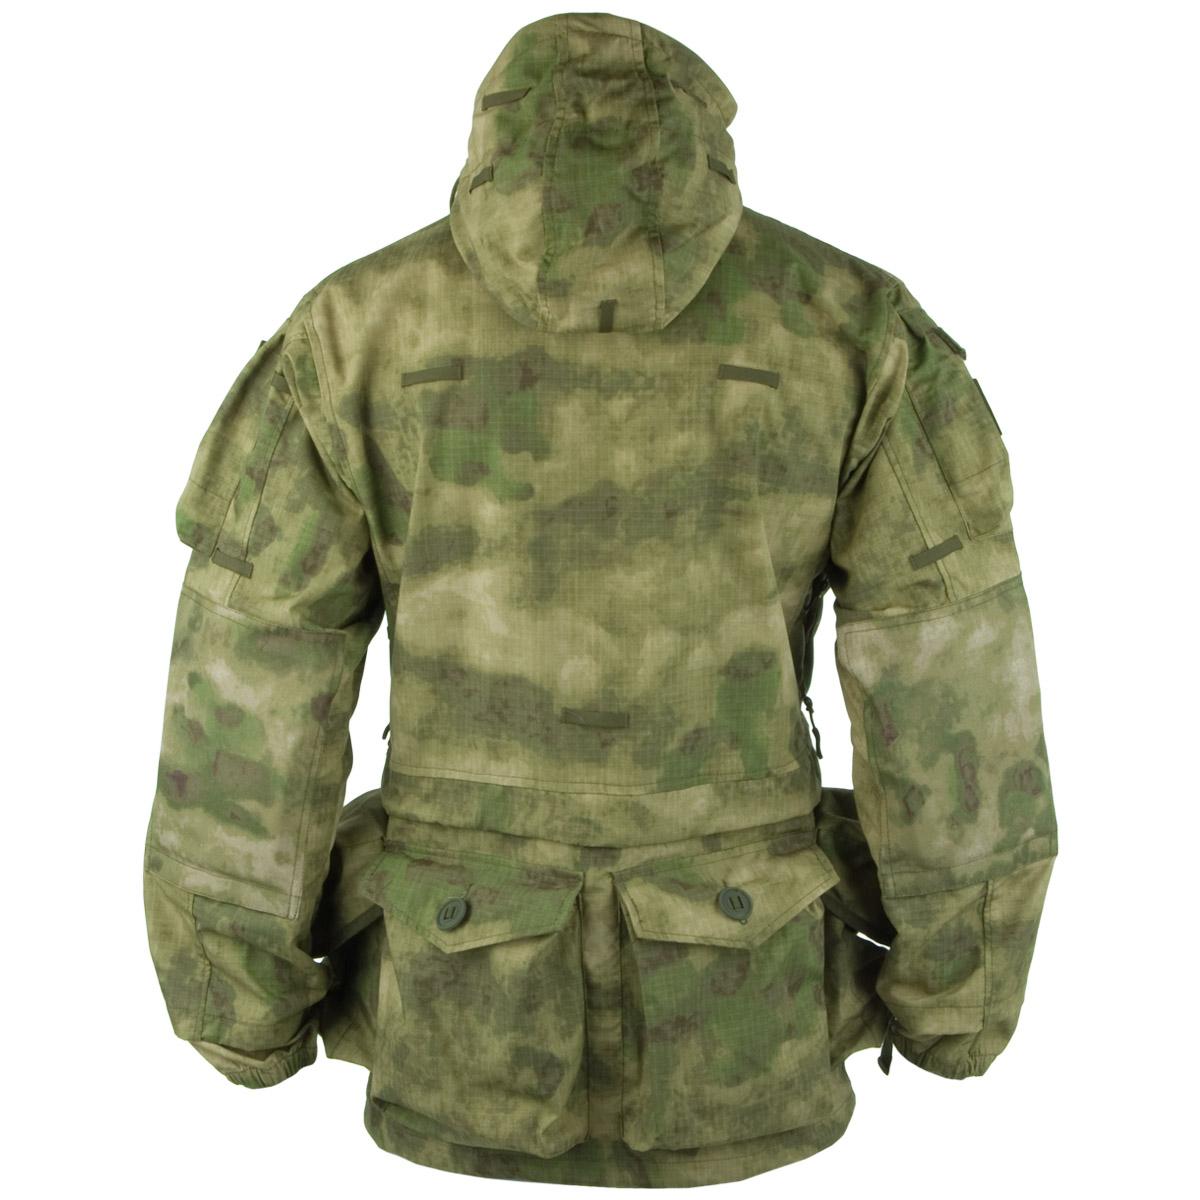 Teesar Army Smock Generation Ii Mens Hooded Jacket Long